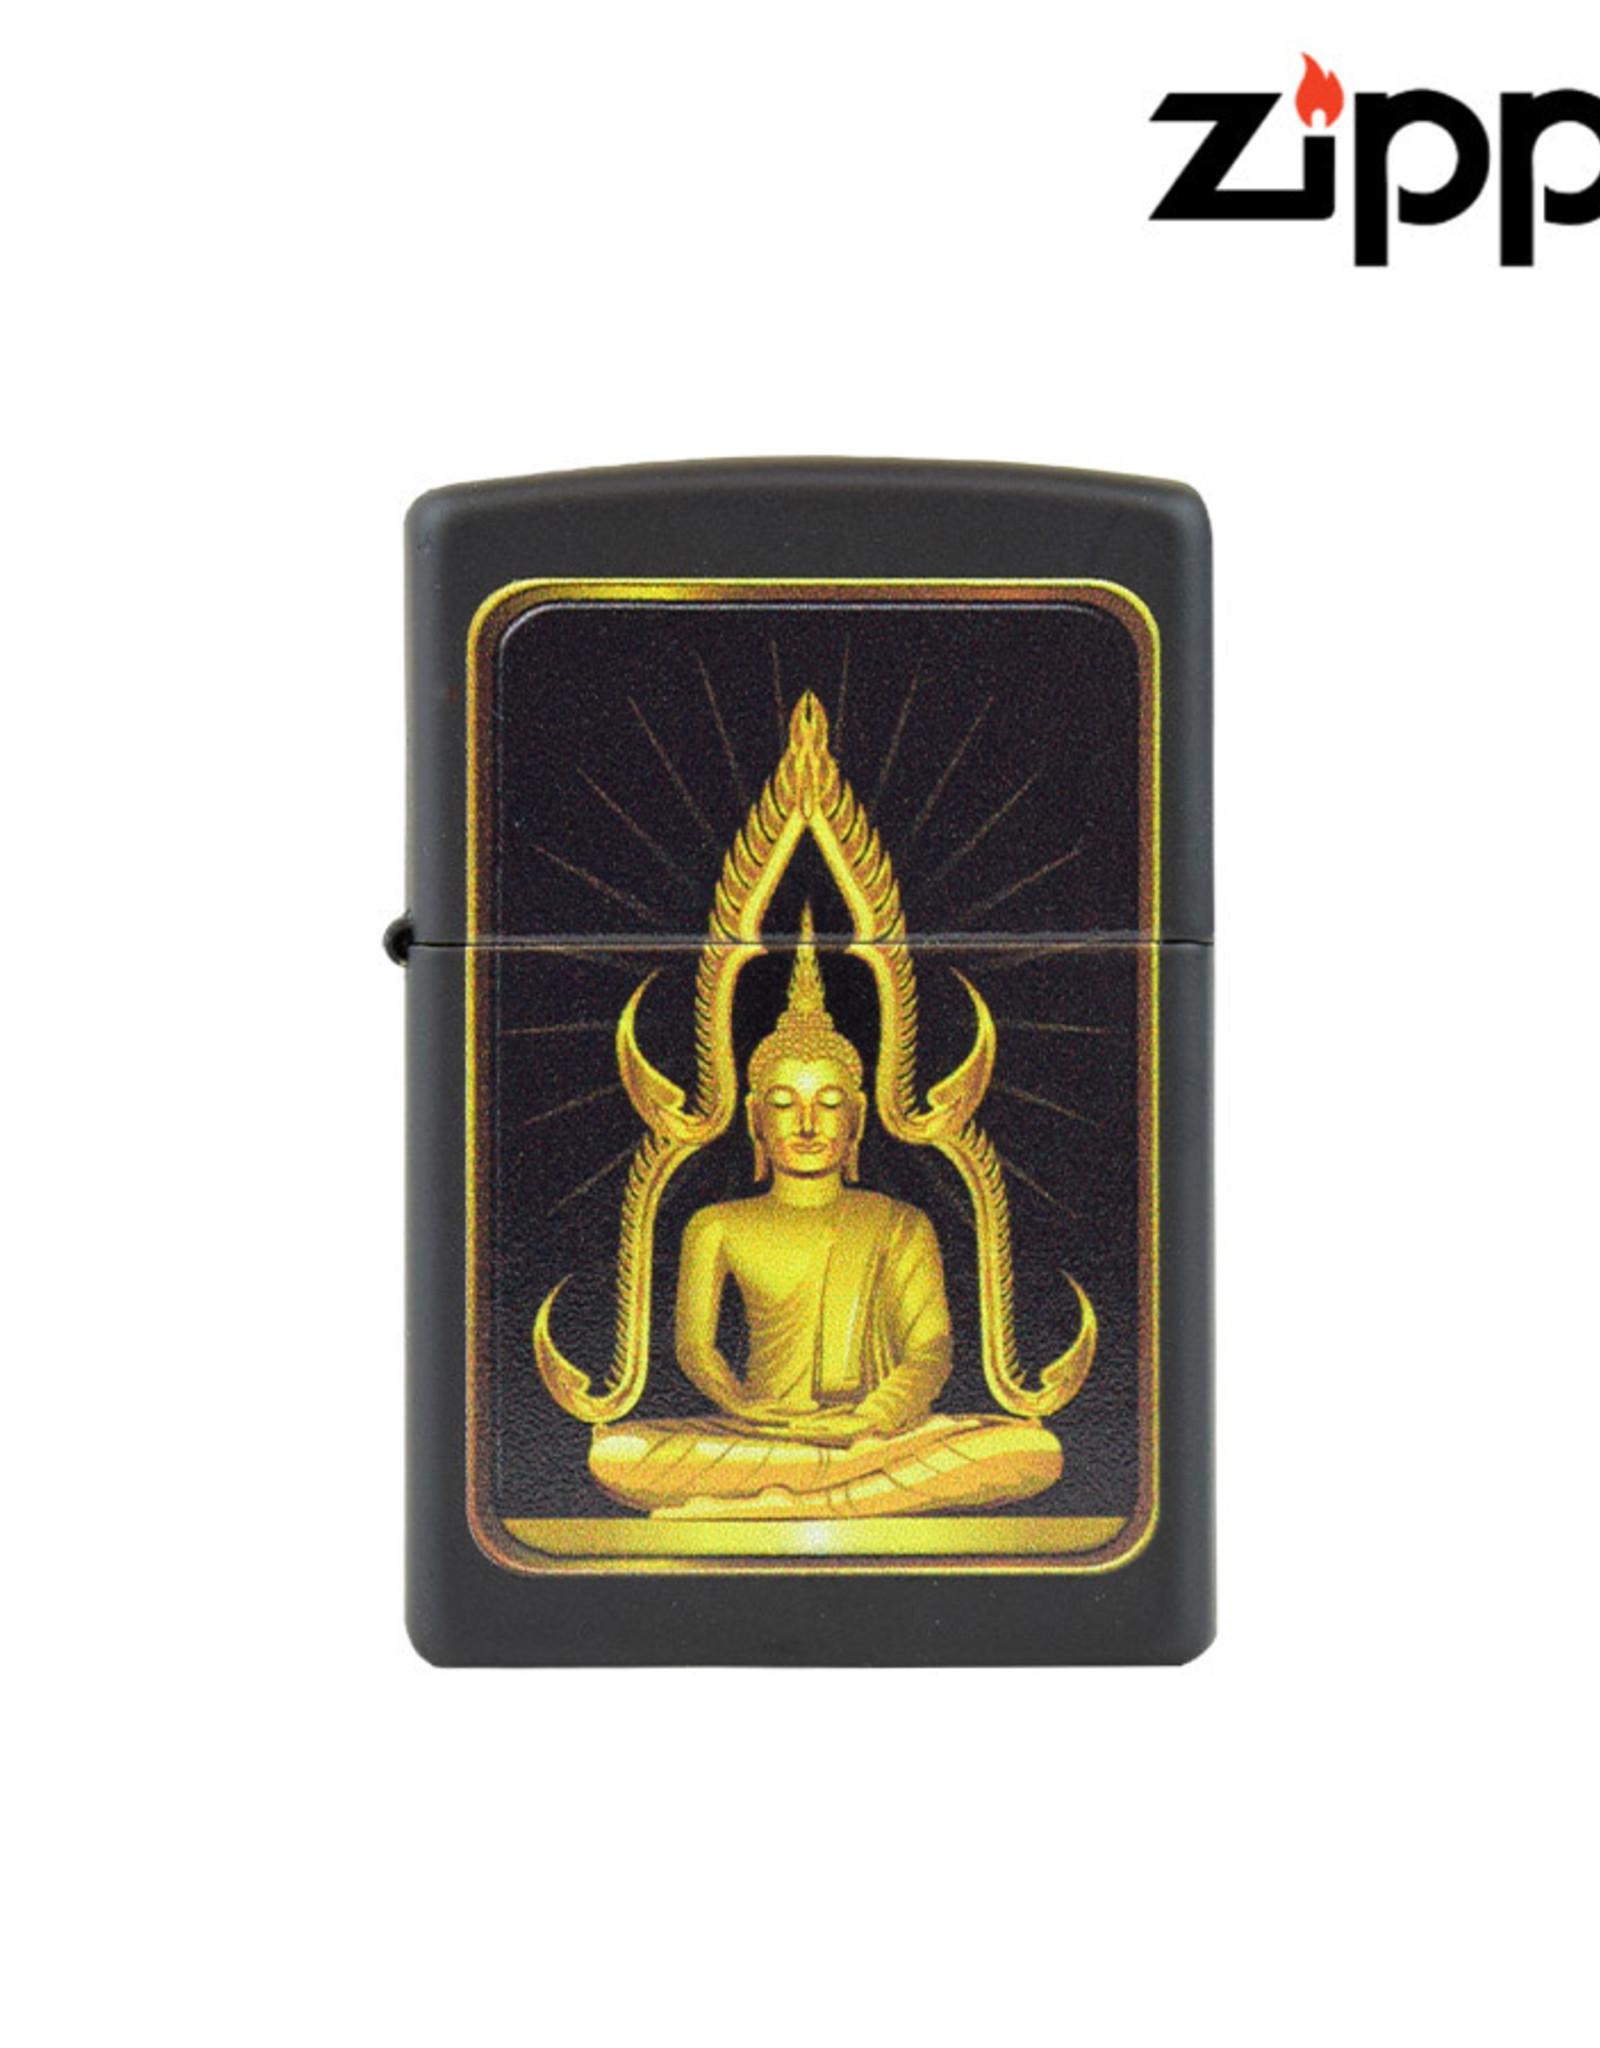 Zippo Gold Buddha Design Zippo